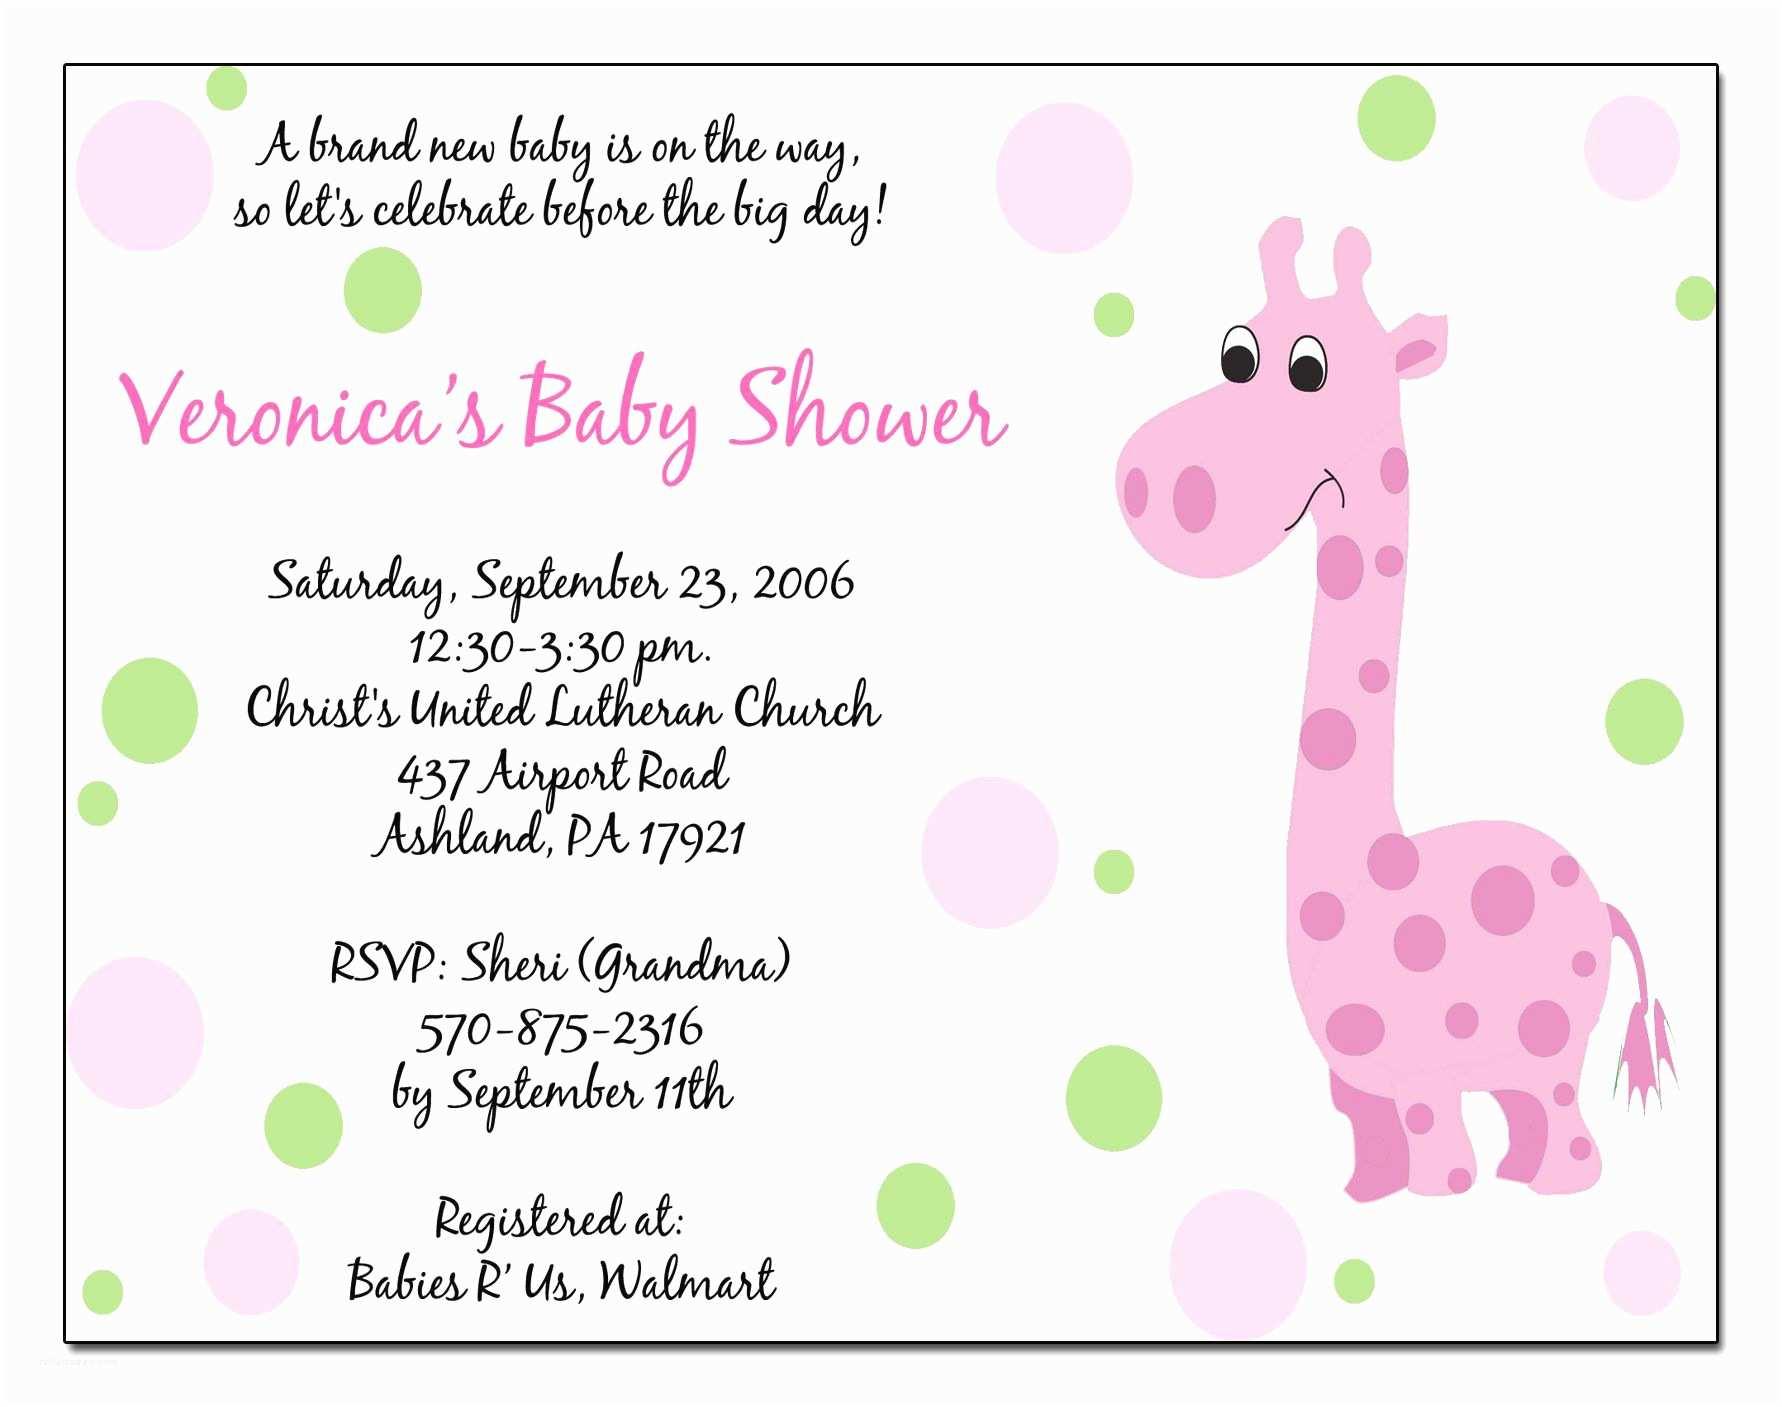 Free Baby Shower Invitations Baby Shower Invitation Baby Shower Invitations Templates